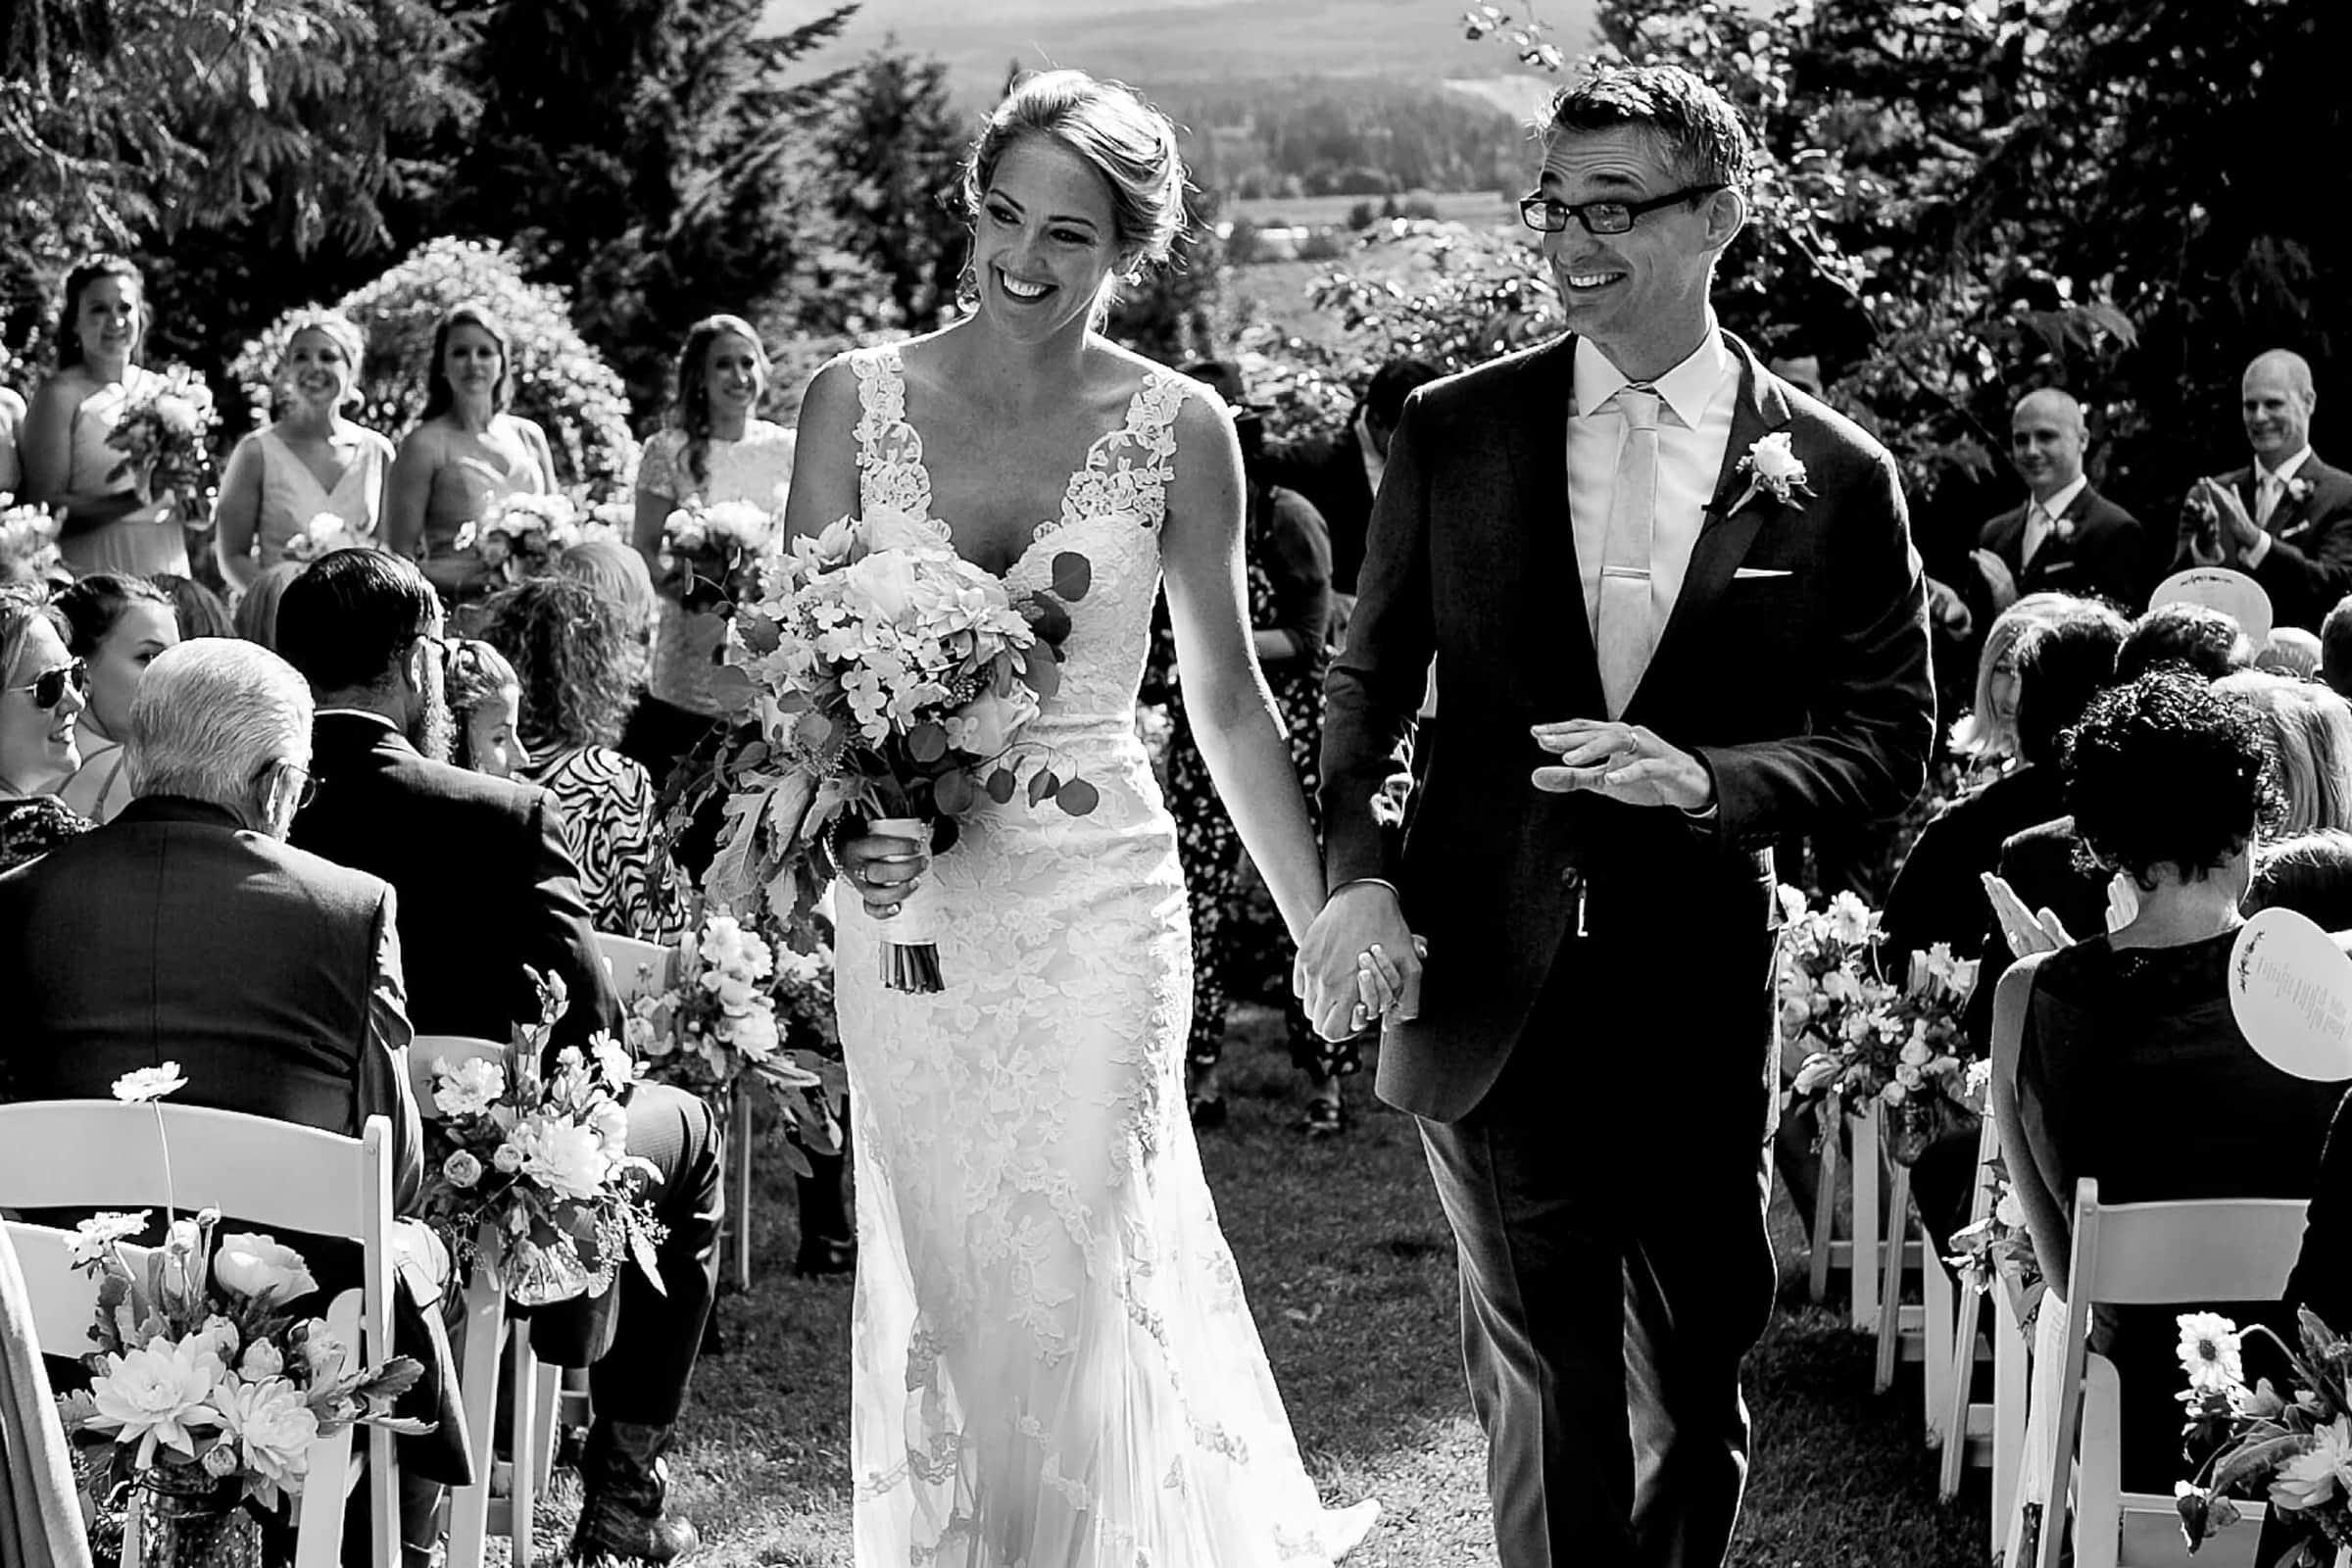 Bride and groom exiting their Mt Hood Organic Farms wedding ceremony near Hood River Oregon